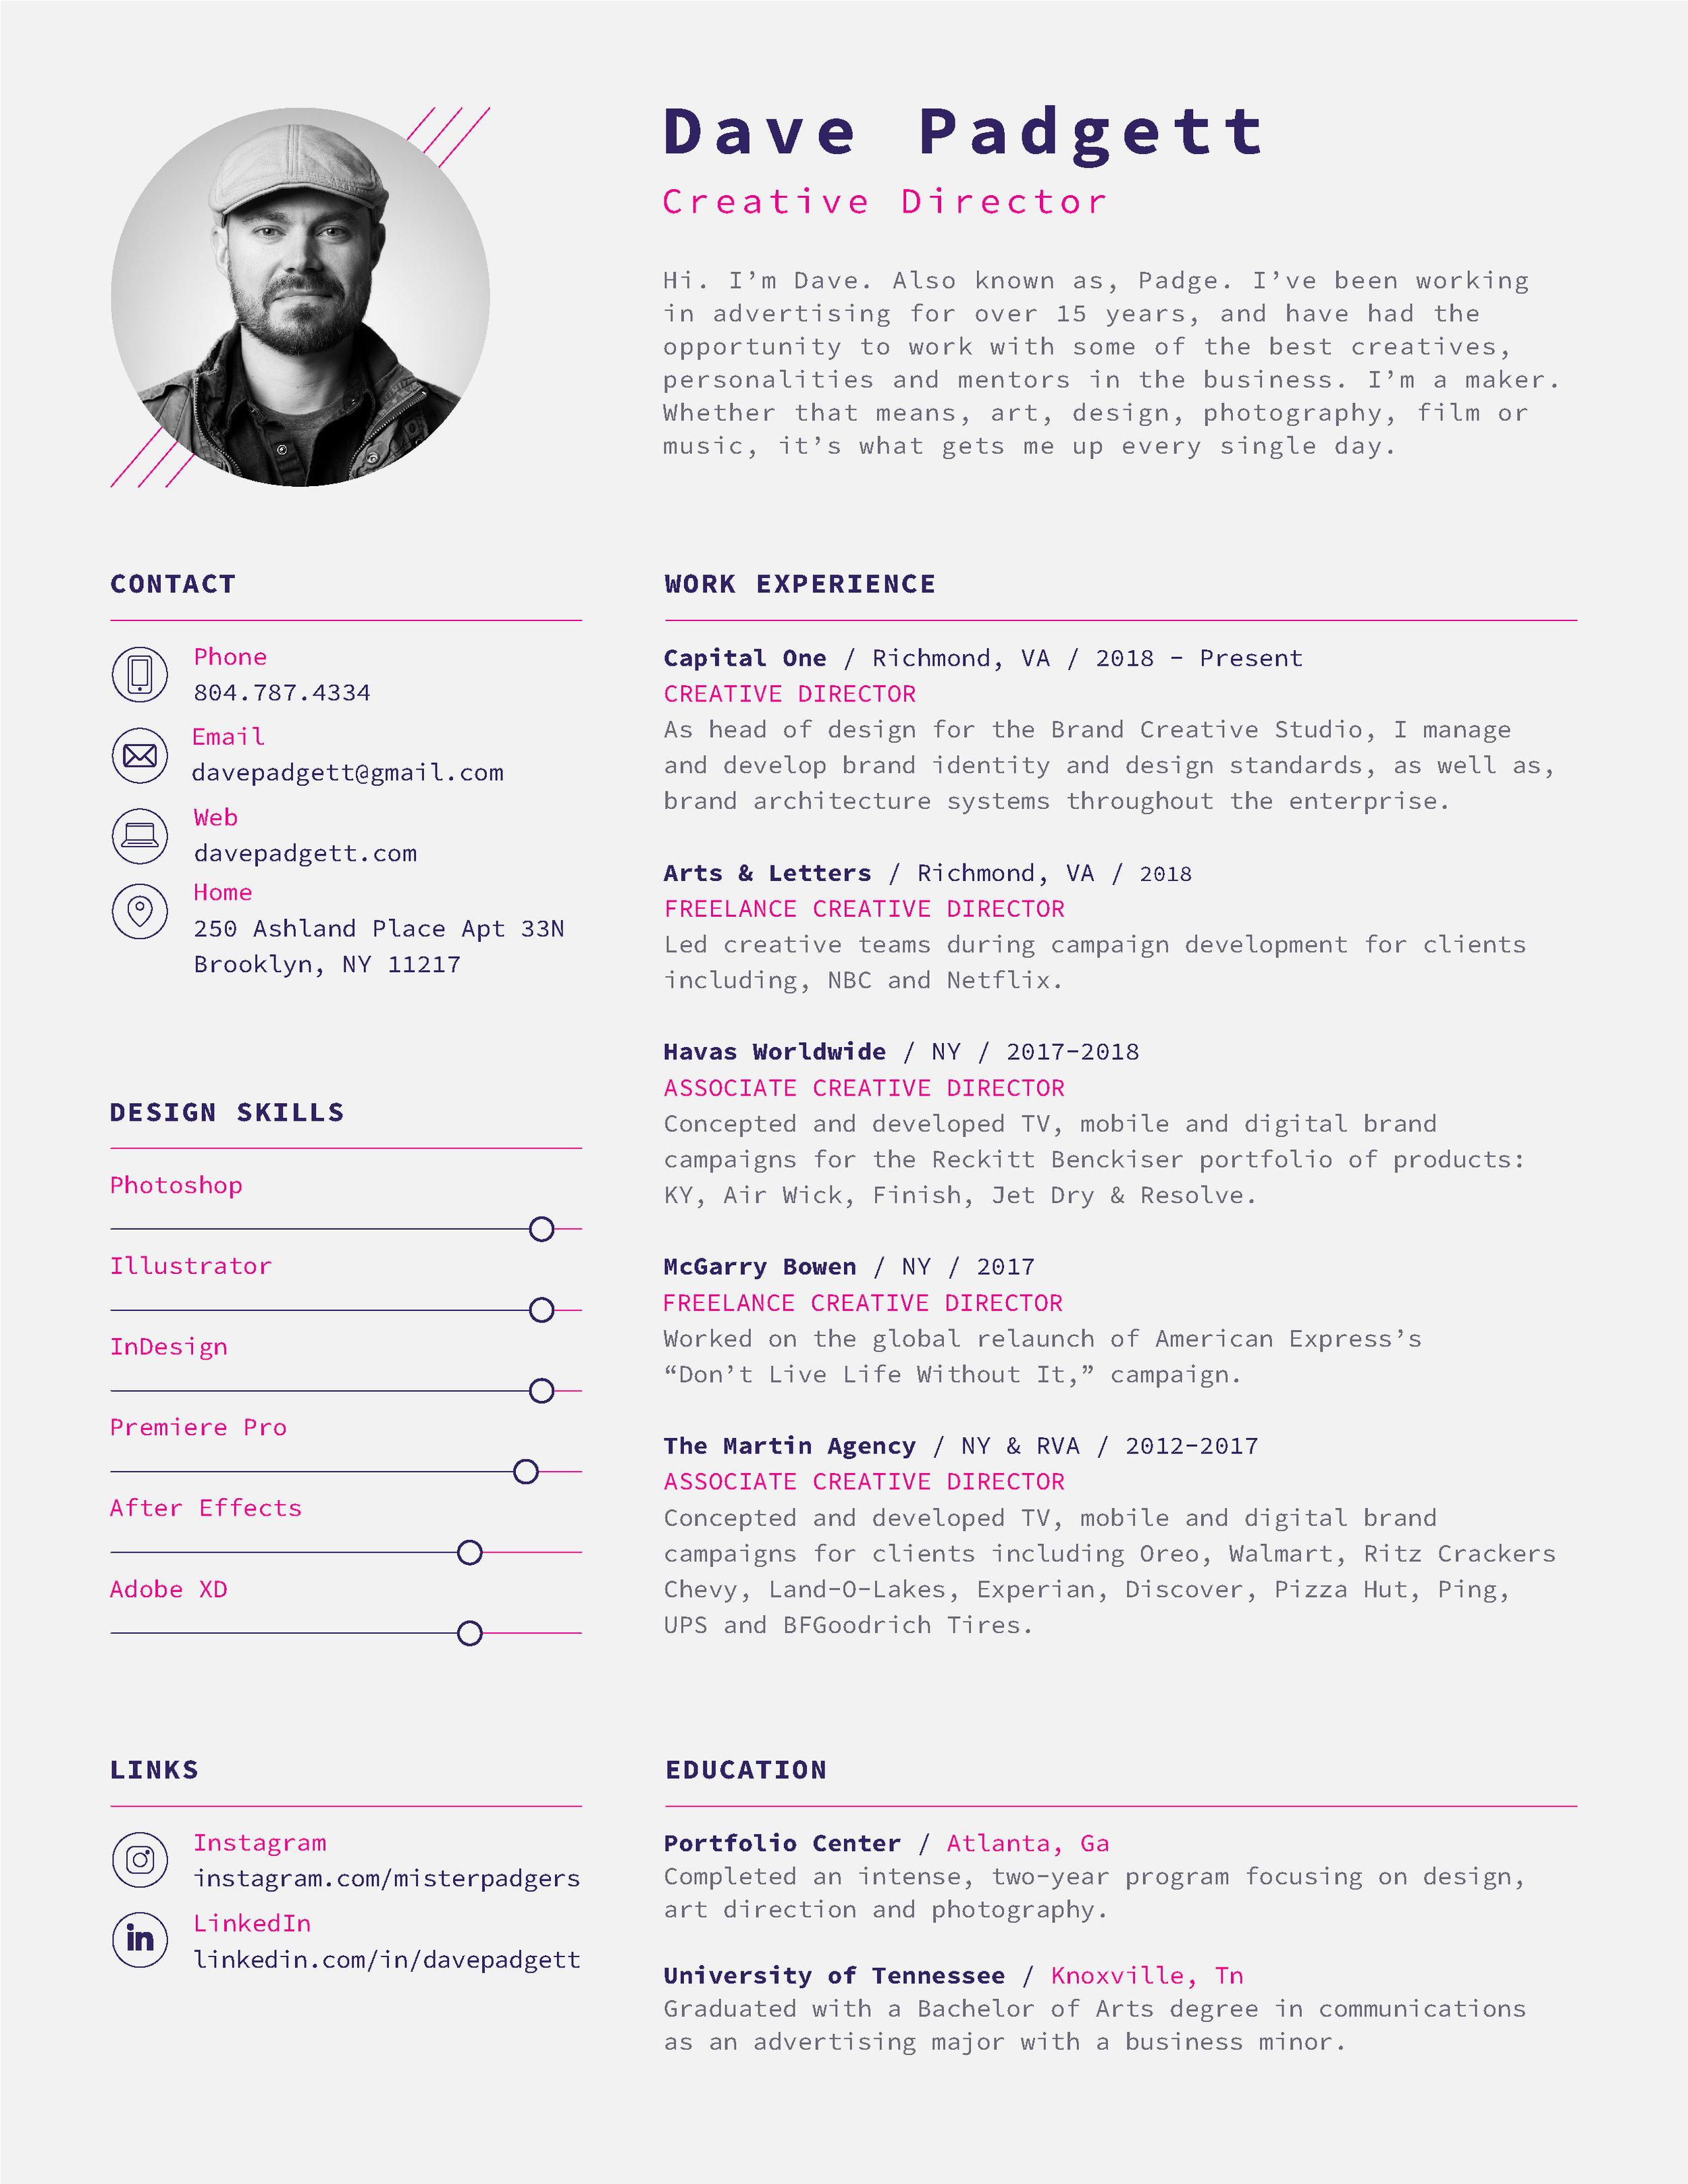 Dave_Padgett_Resume_2019.jpg